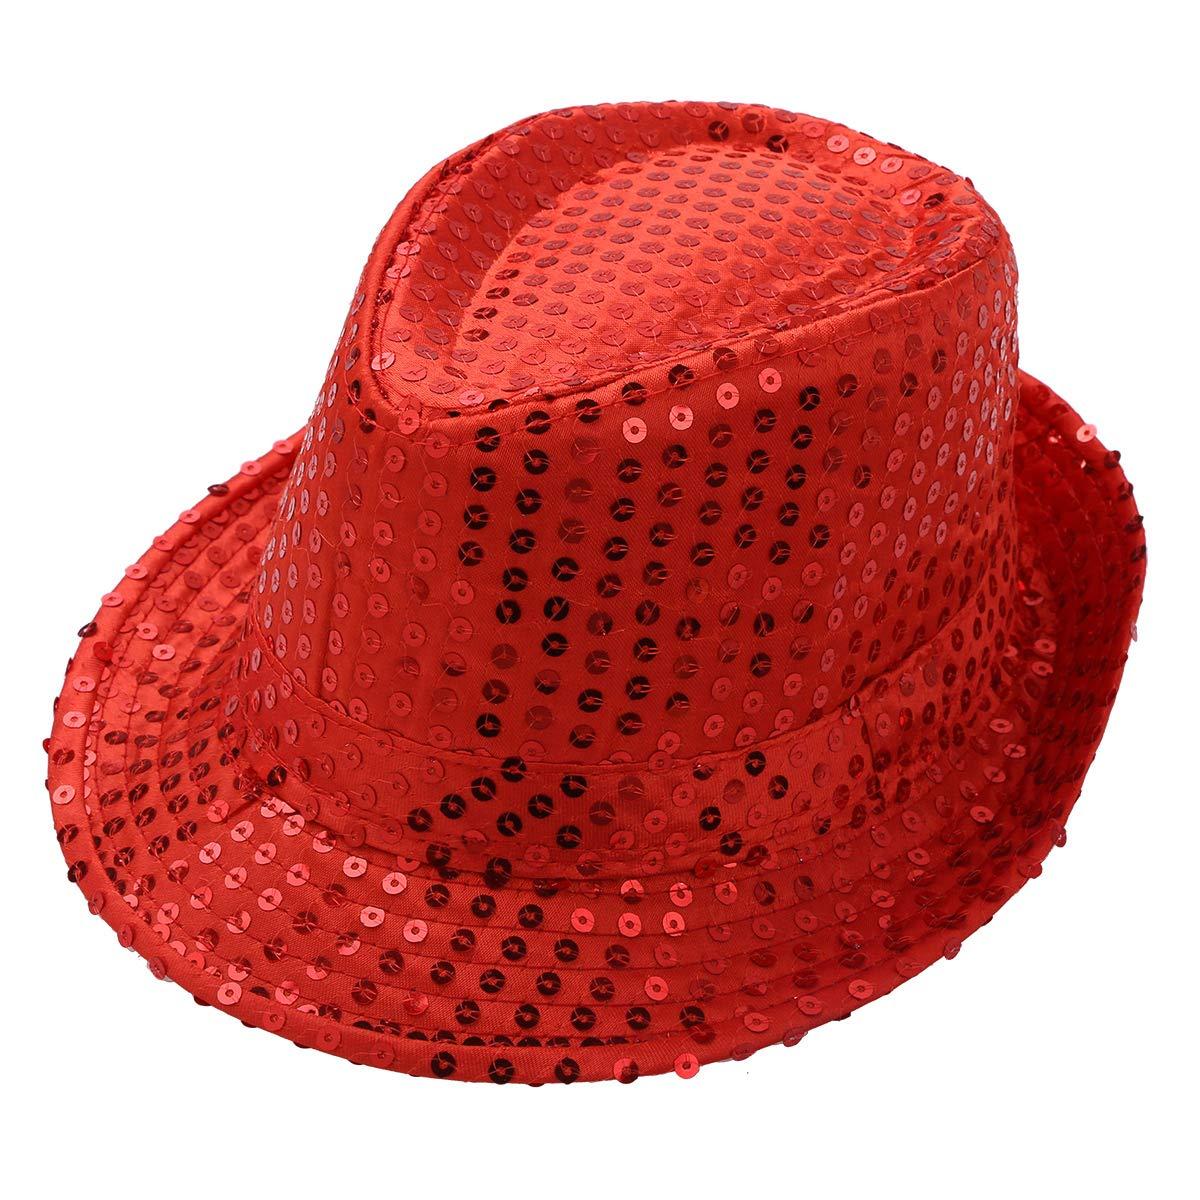 MSemis Unisex Children Solid Color Sequins Fedora Hat Hip Hop Jazz Latin Street Dancewear Cap Red One Size